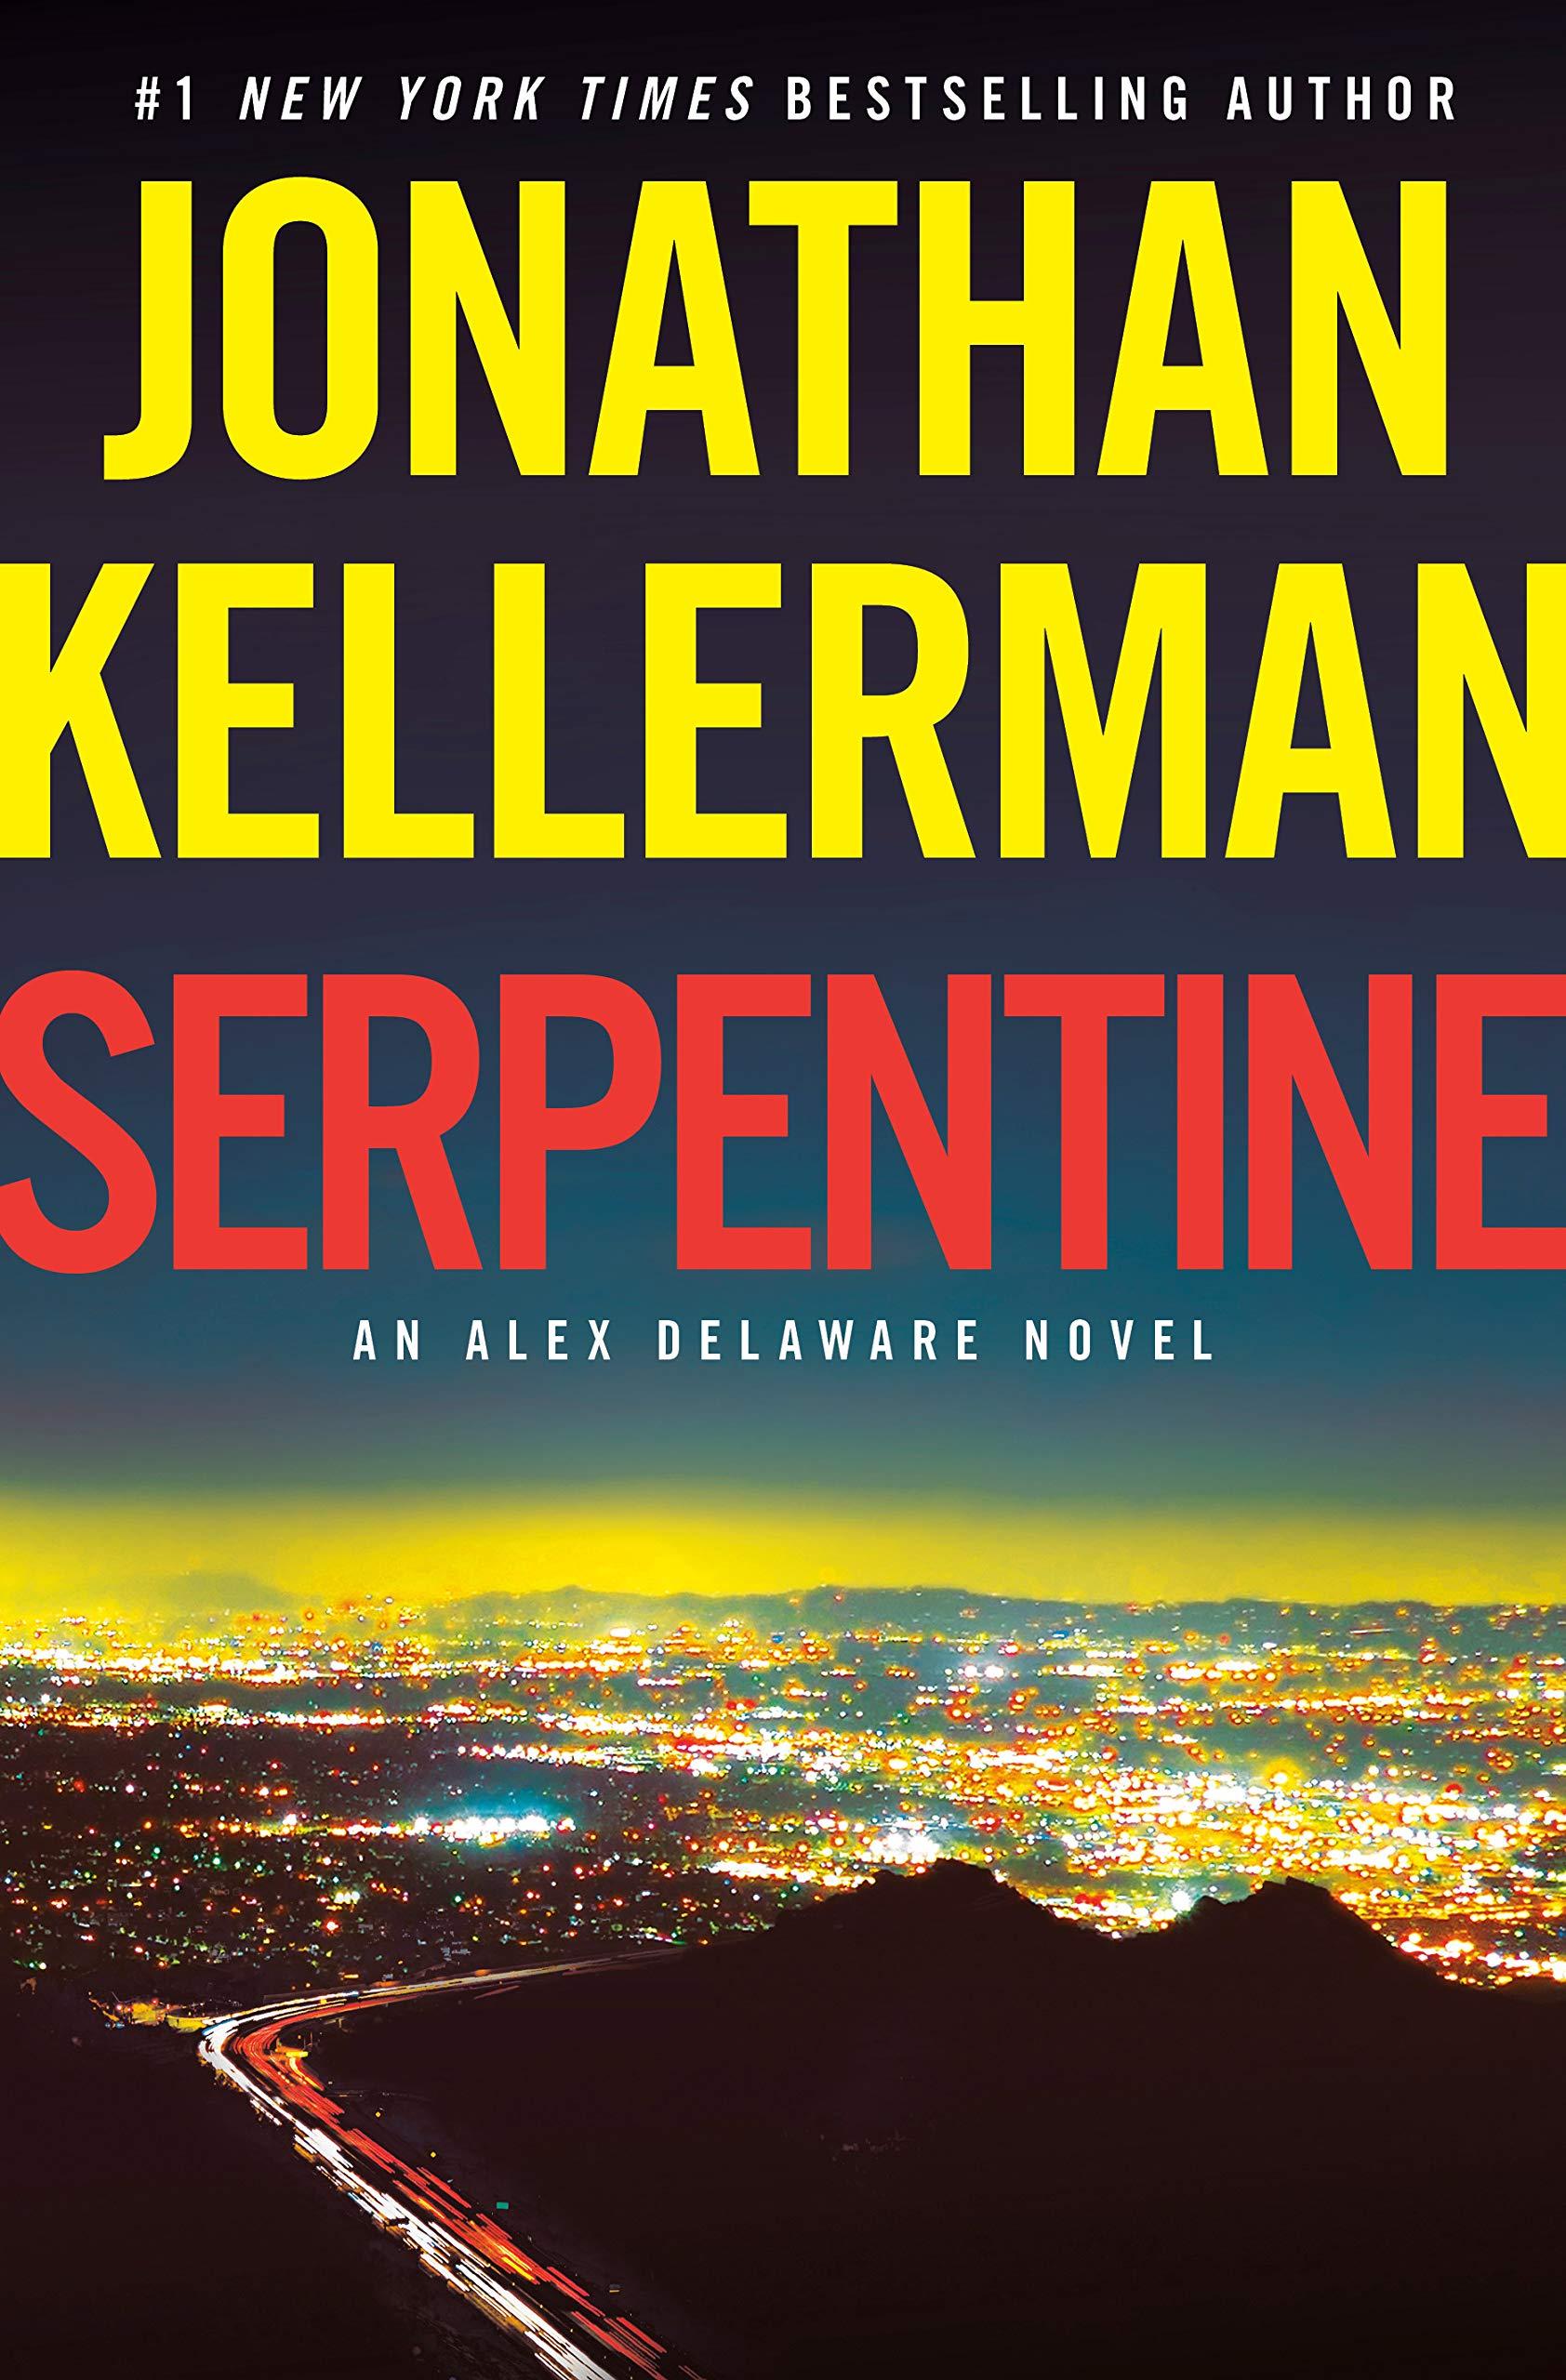 Cover image of Serpentine by Jonathan Kellerman